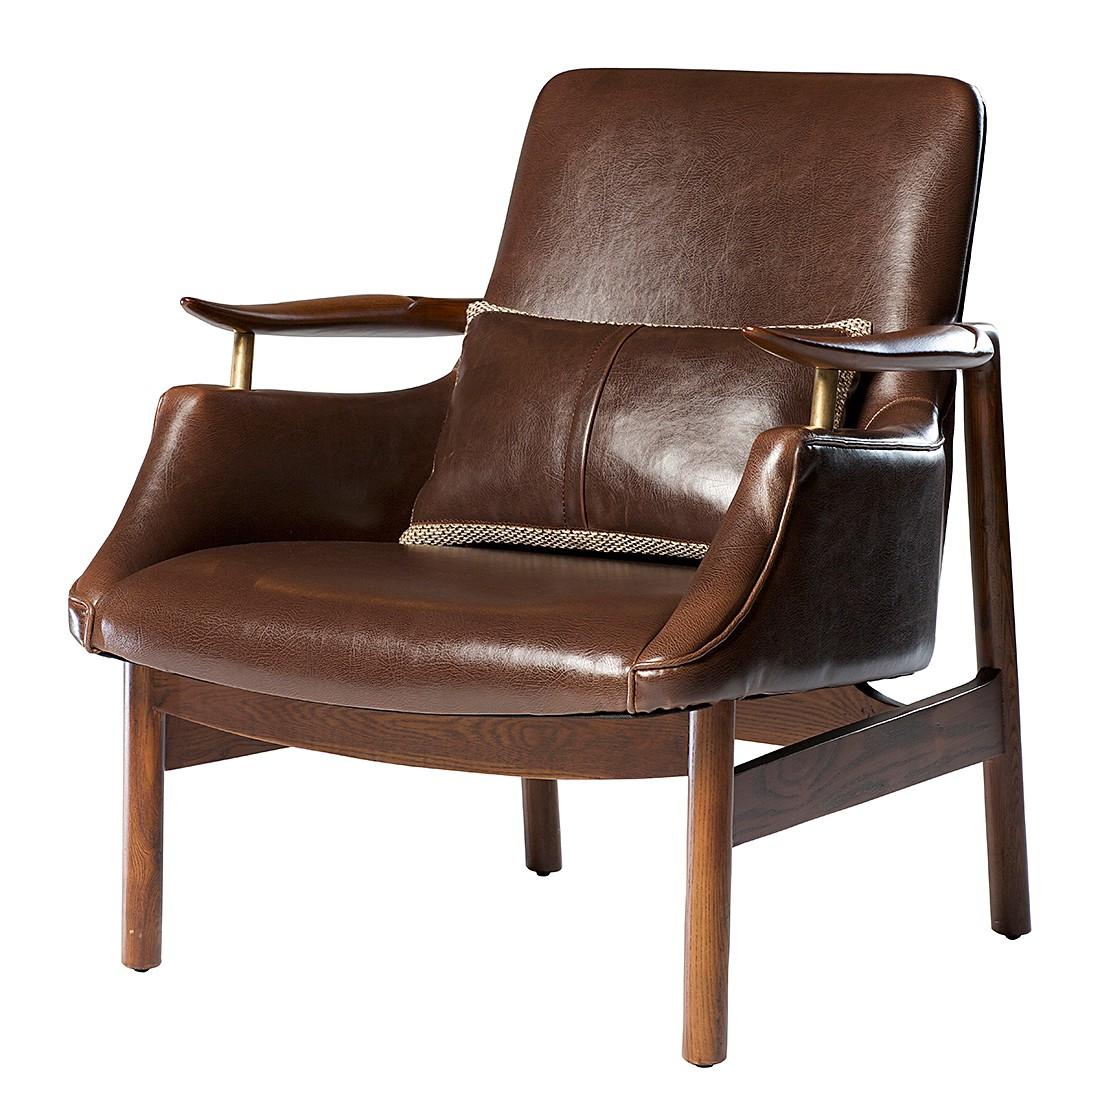 Lounge sessel kunstleder braun  Loungesessel Tycho - Kunstleder - Braun, Dan-Form - Tipps vom ...